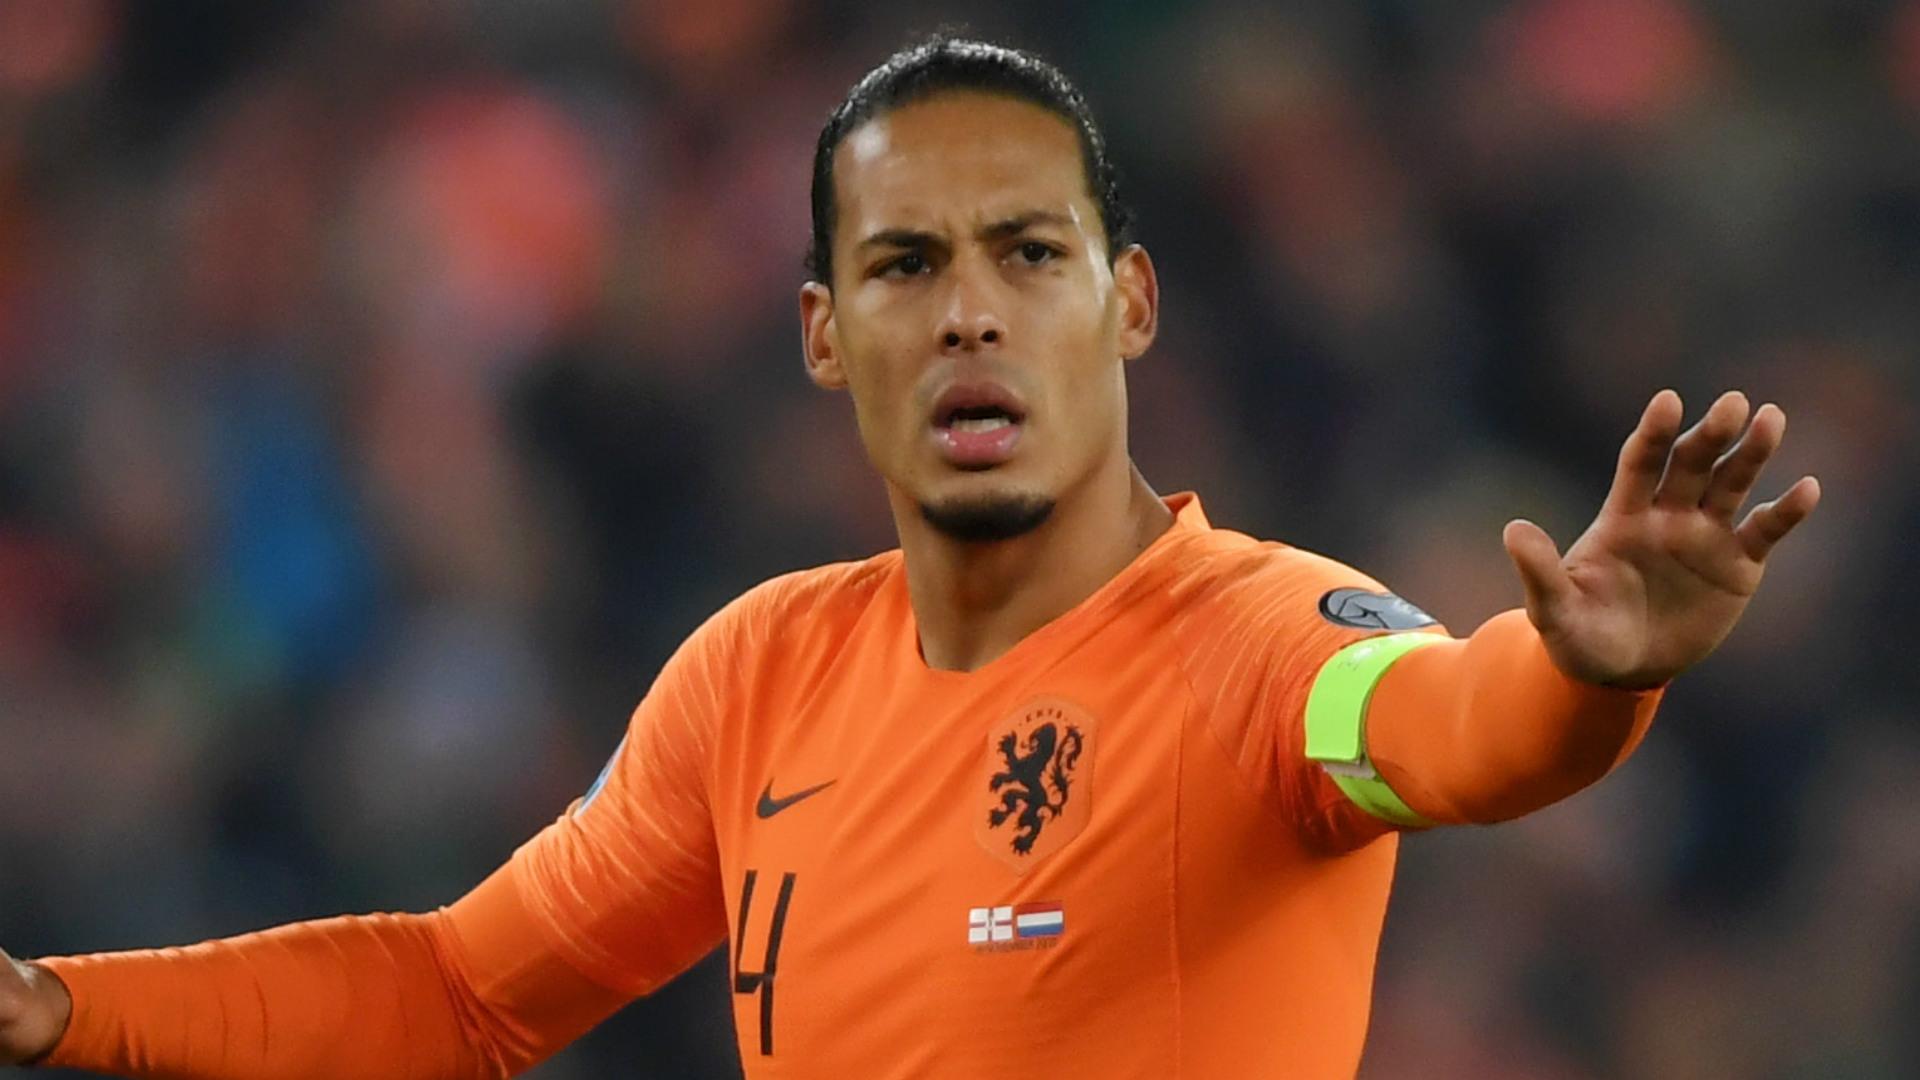 Video: Van Dijk makes no excuses for Dutch defeat to Italy